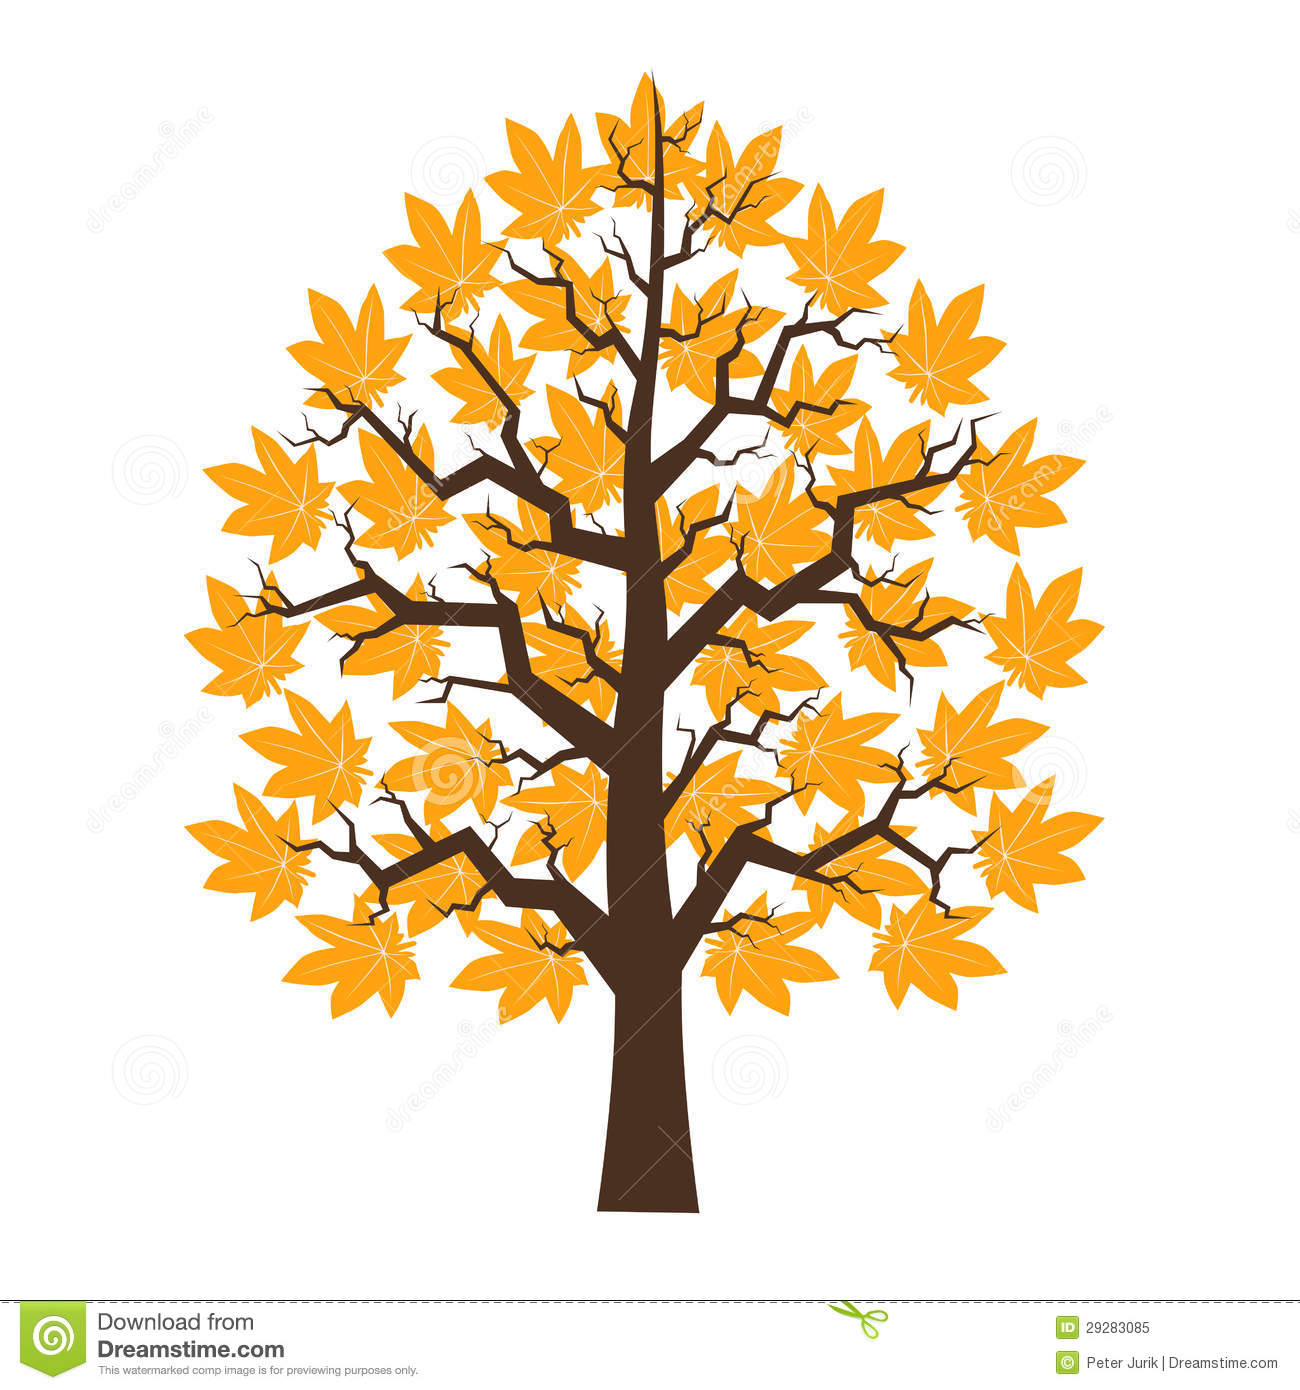 Orange maple tree clipart 20 free Cliparts | Download ...